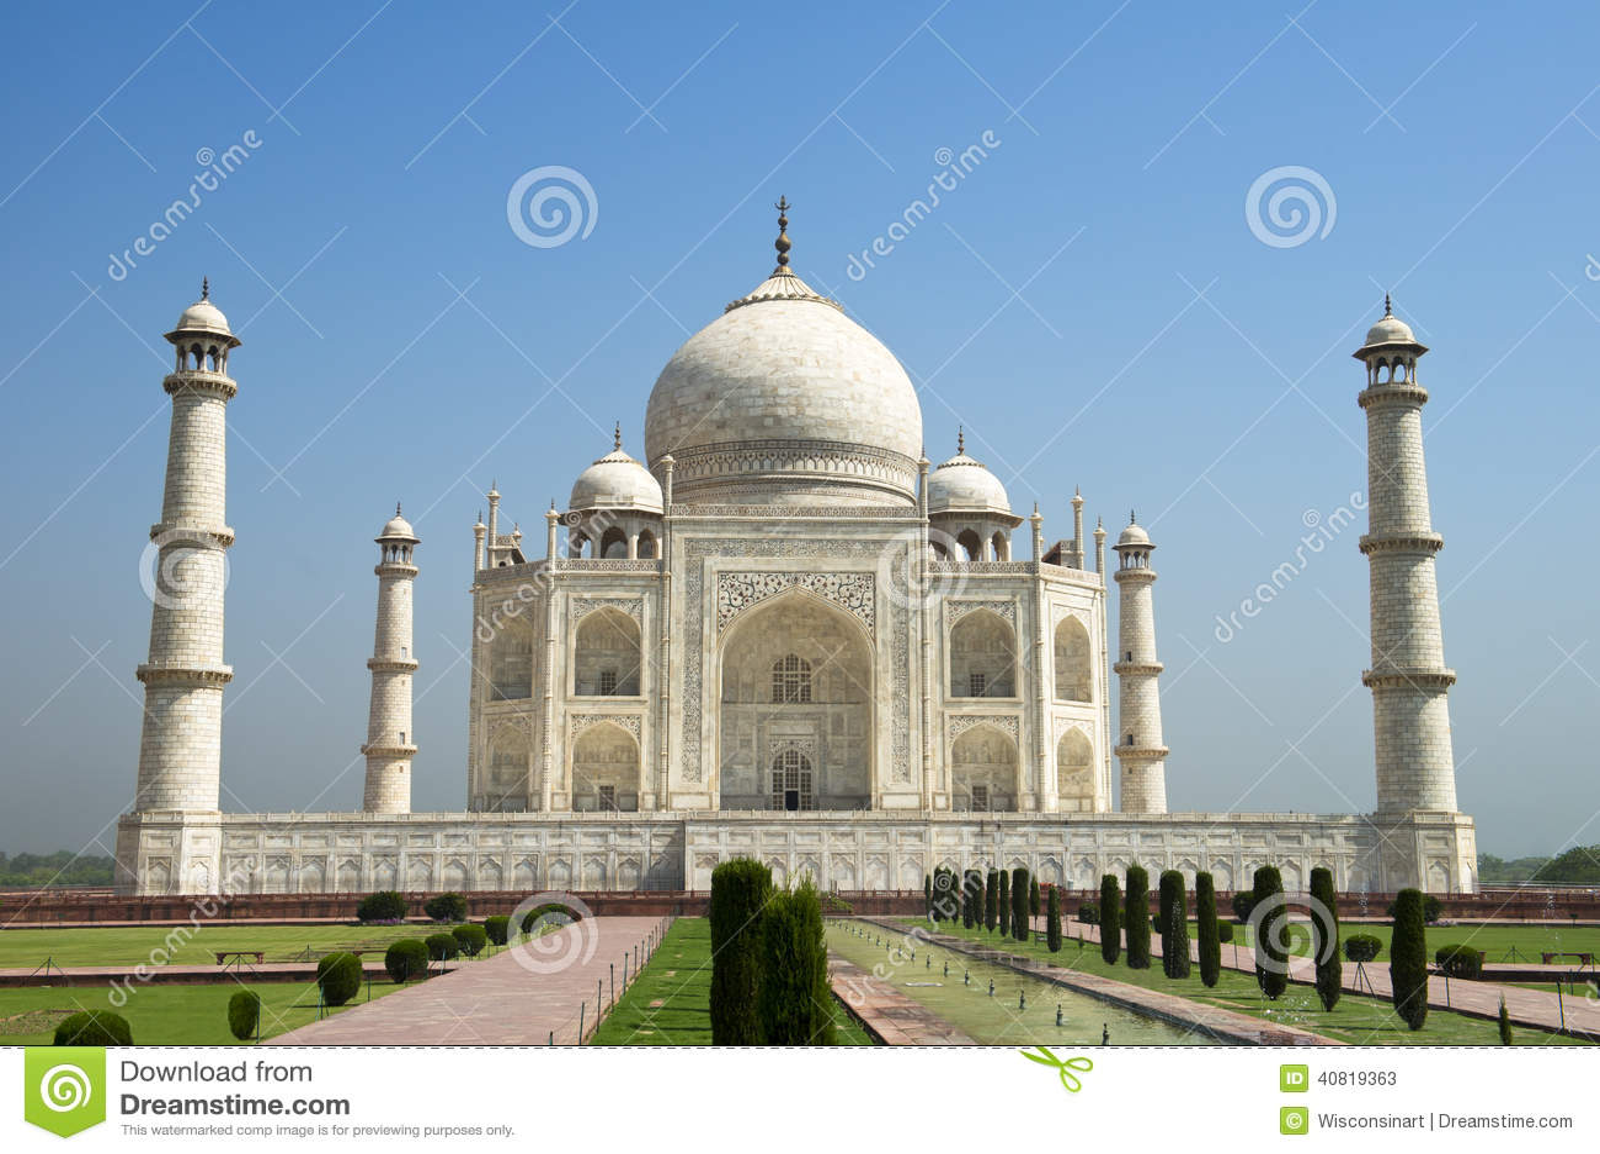 Taj Mahal Travel Agra, India, Blue Sky